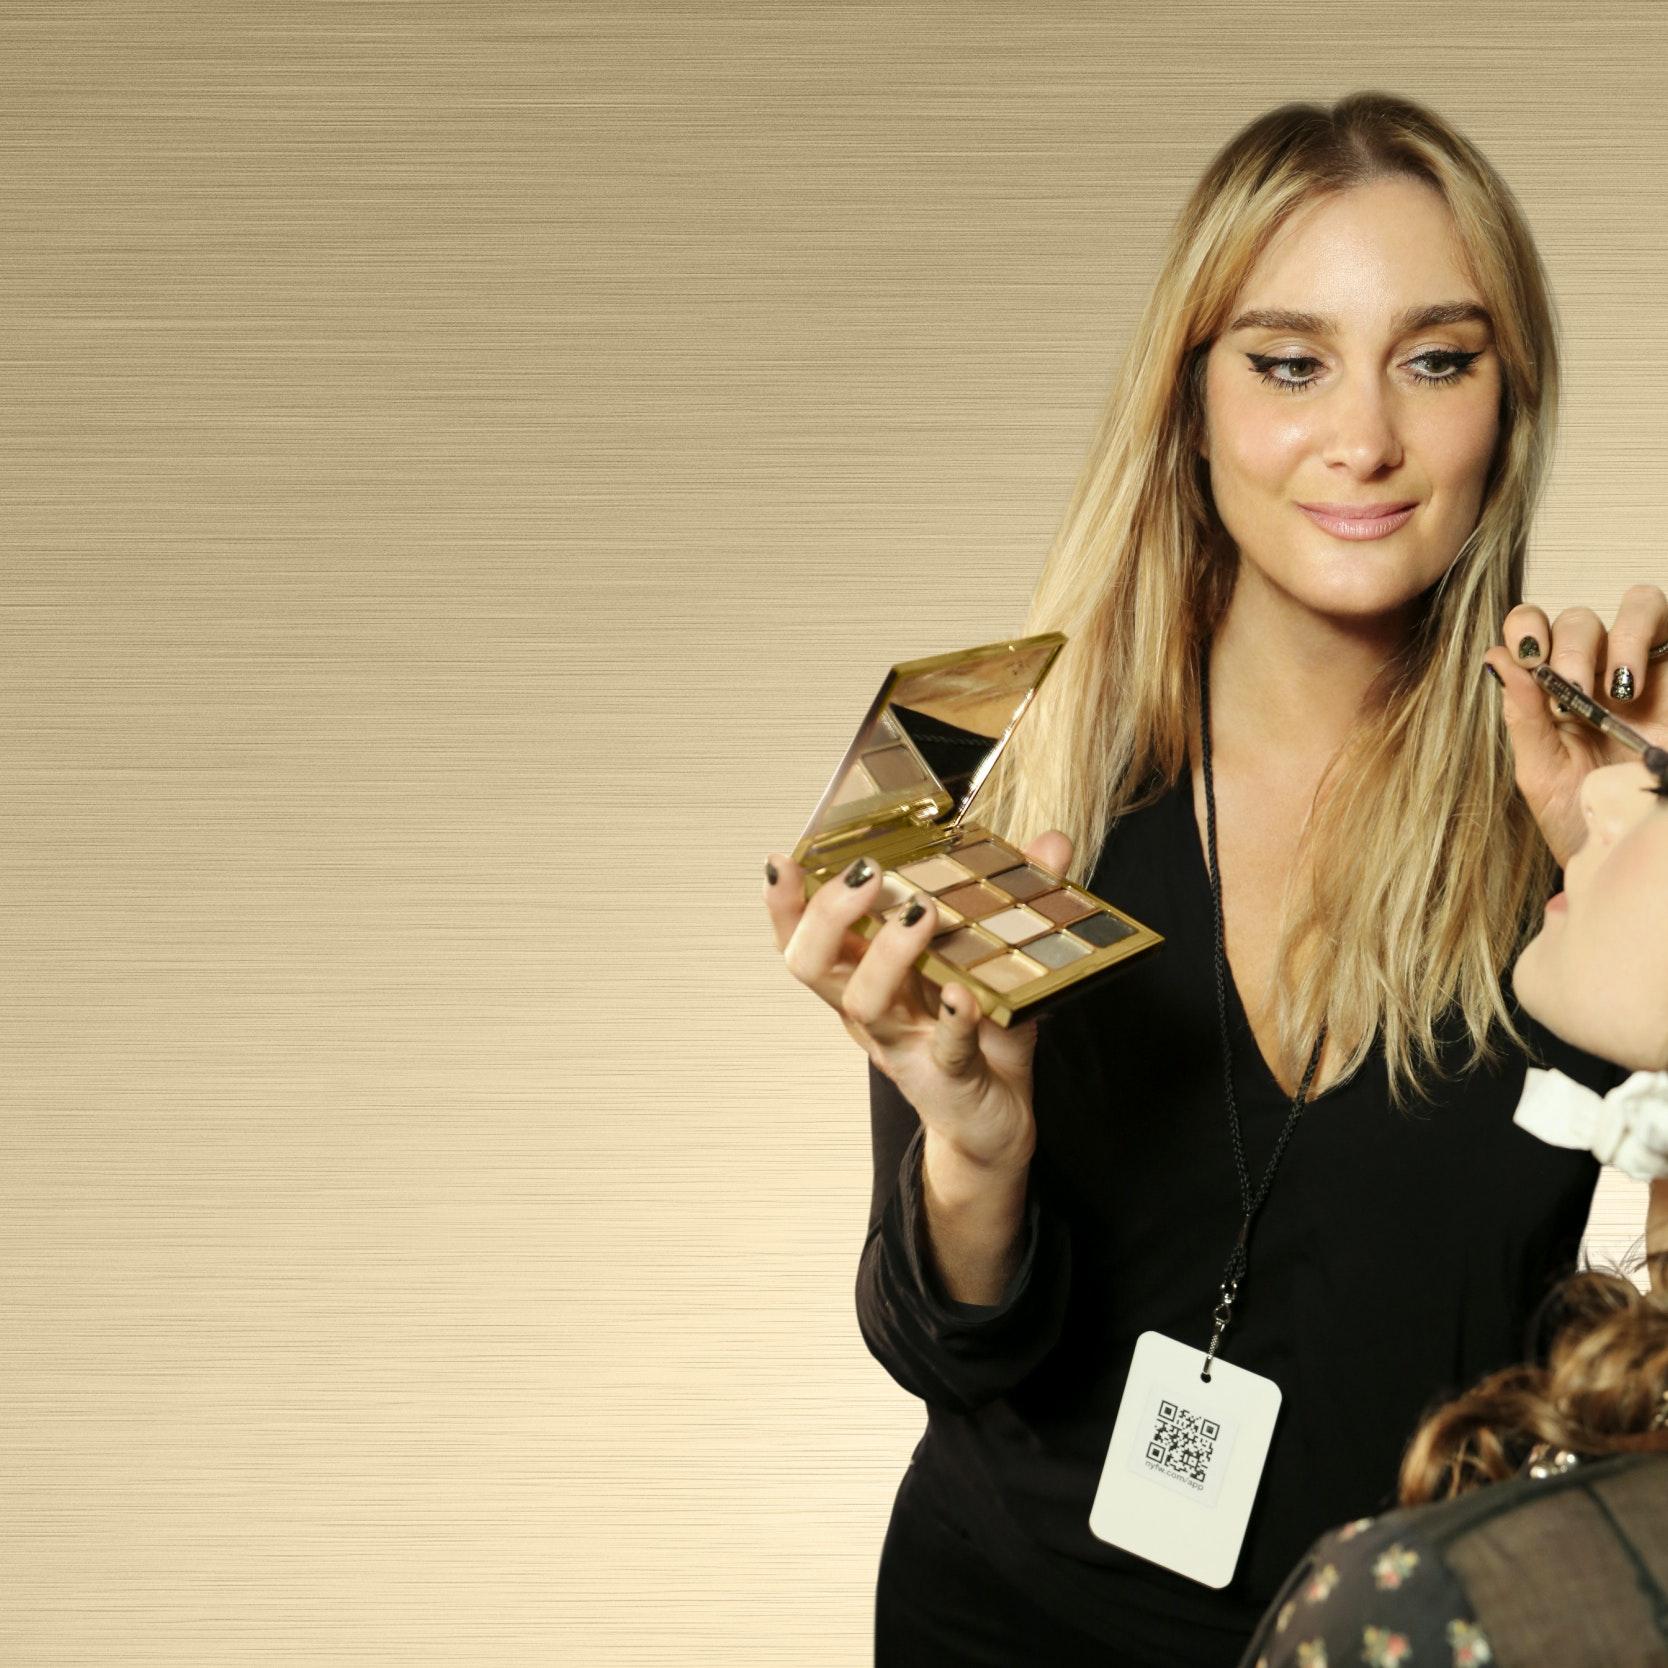 Behind the Curtain: Sarah Lucero, Global Executive Director of Creative Artistry for Stila Cosmetics